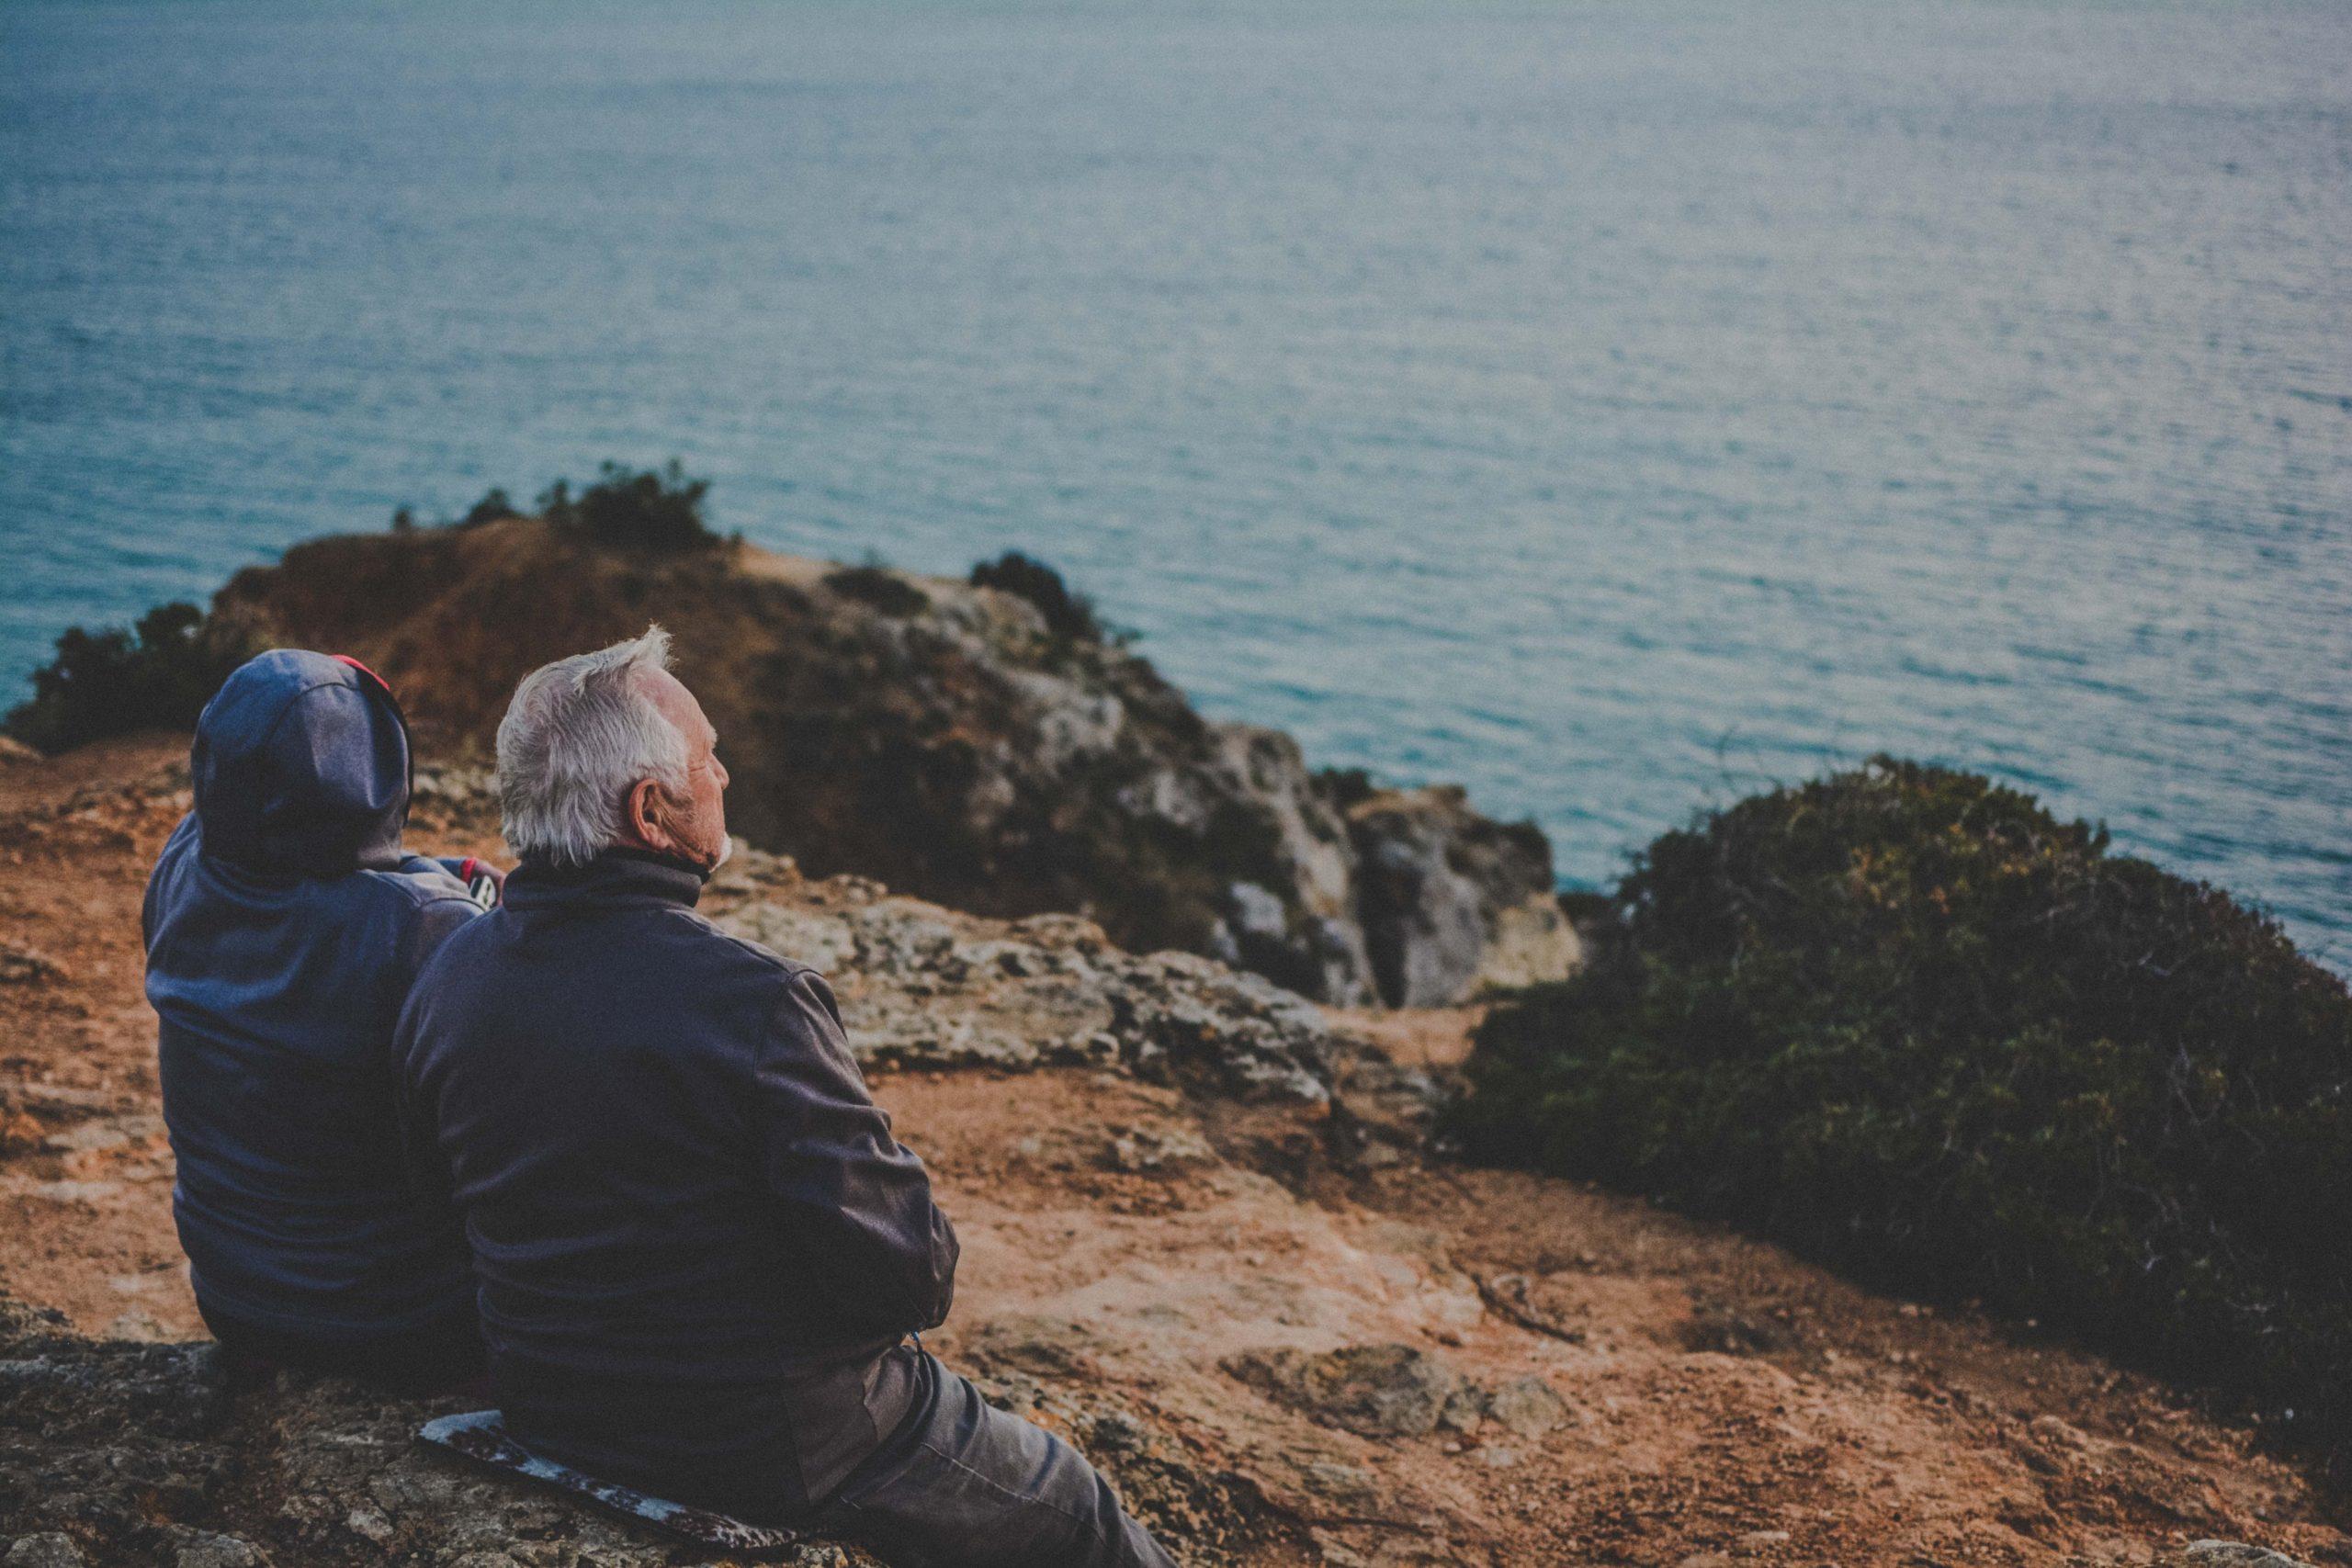 When Should I Start Social Security